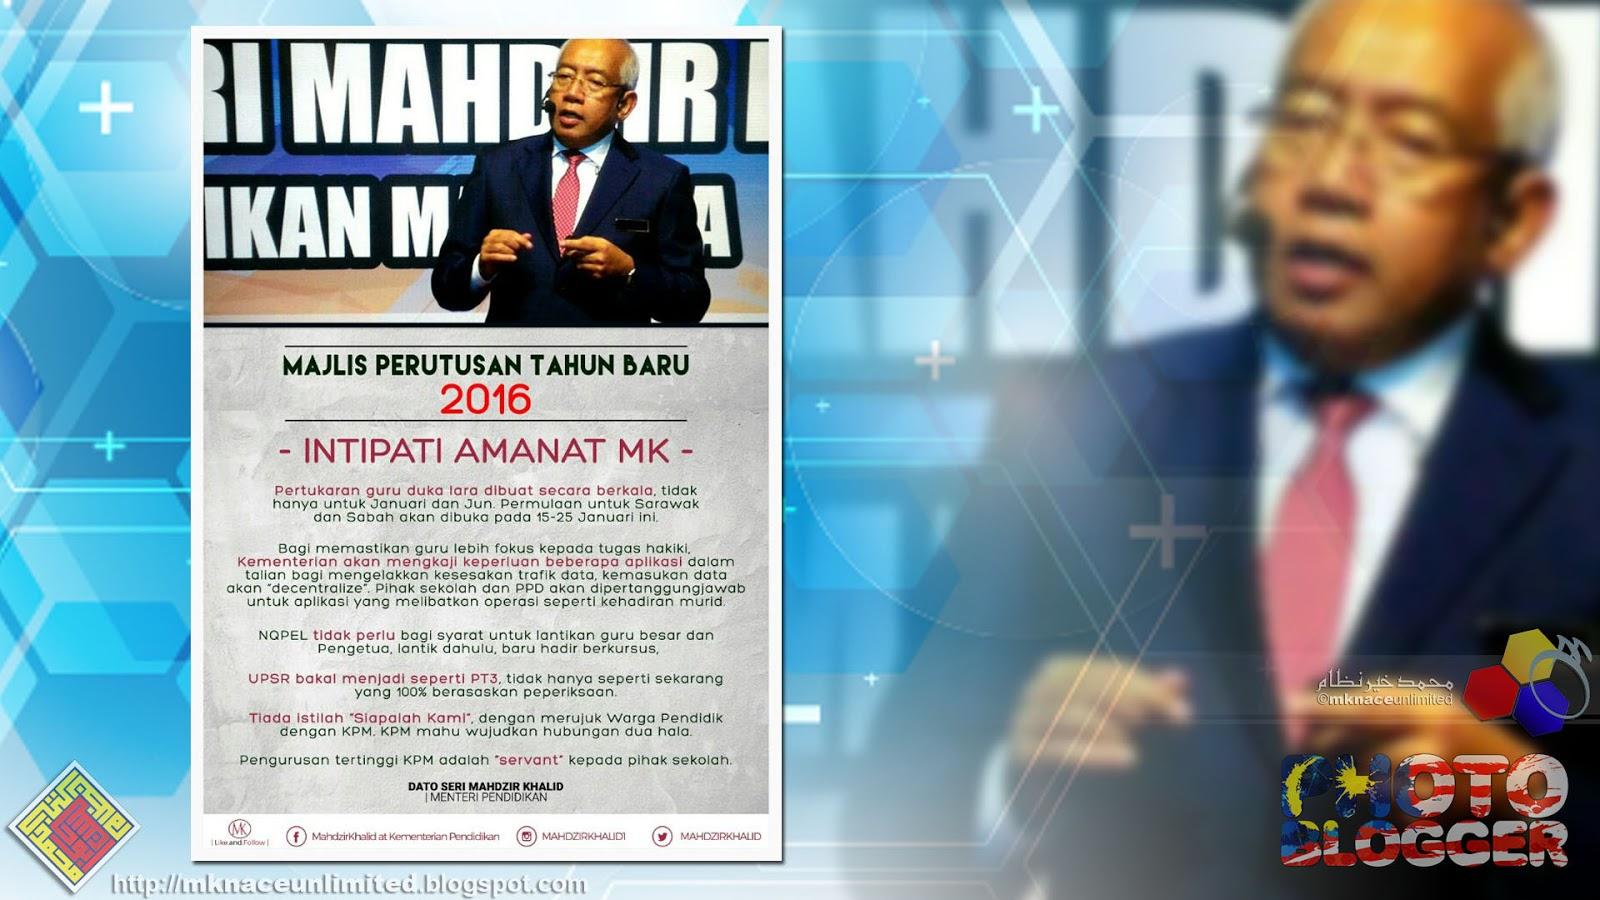 Ucapan Menteri Pendidikan Majlis Perutusan Tahun Baharu 2016 Tcash Vaganza 32 Milo Malaysia Activ Go Kementerian